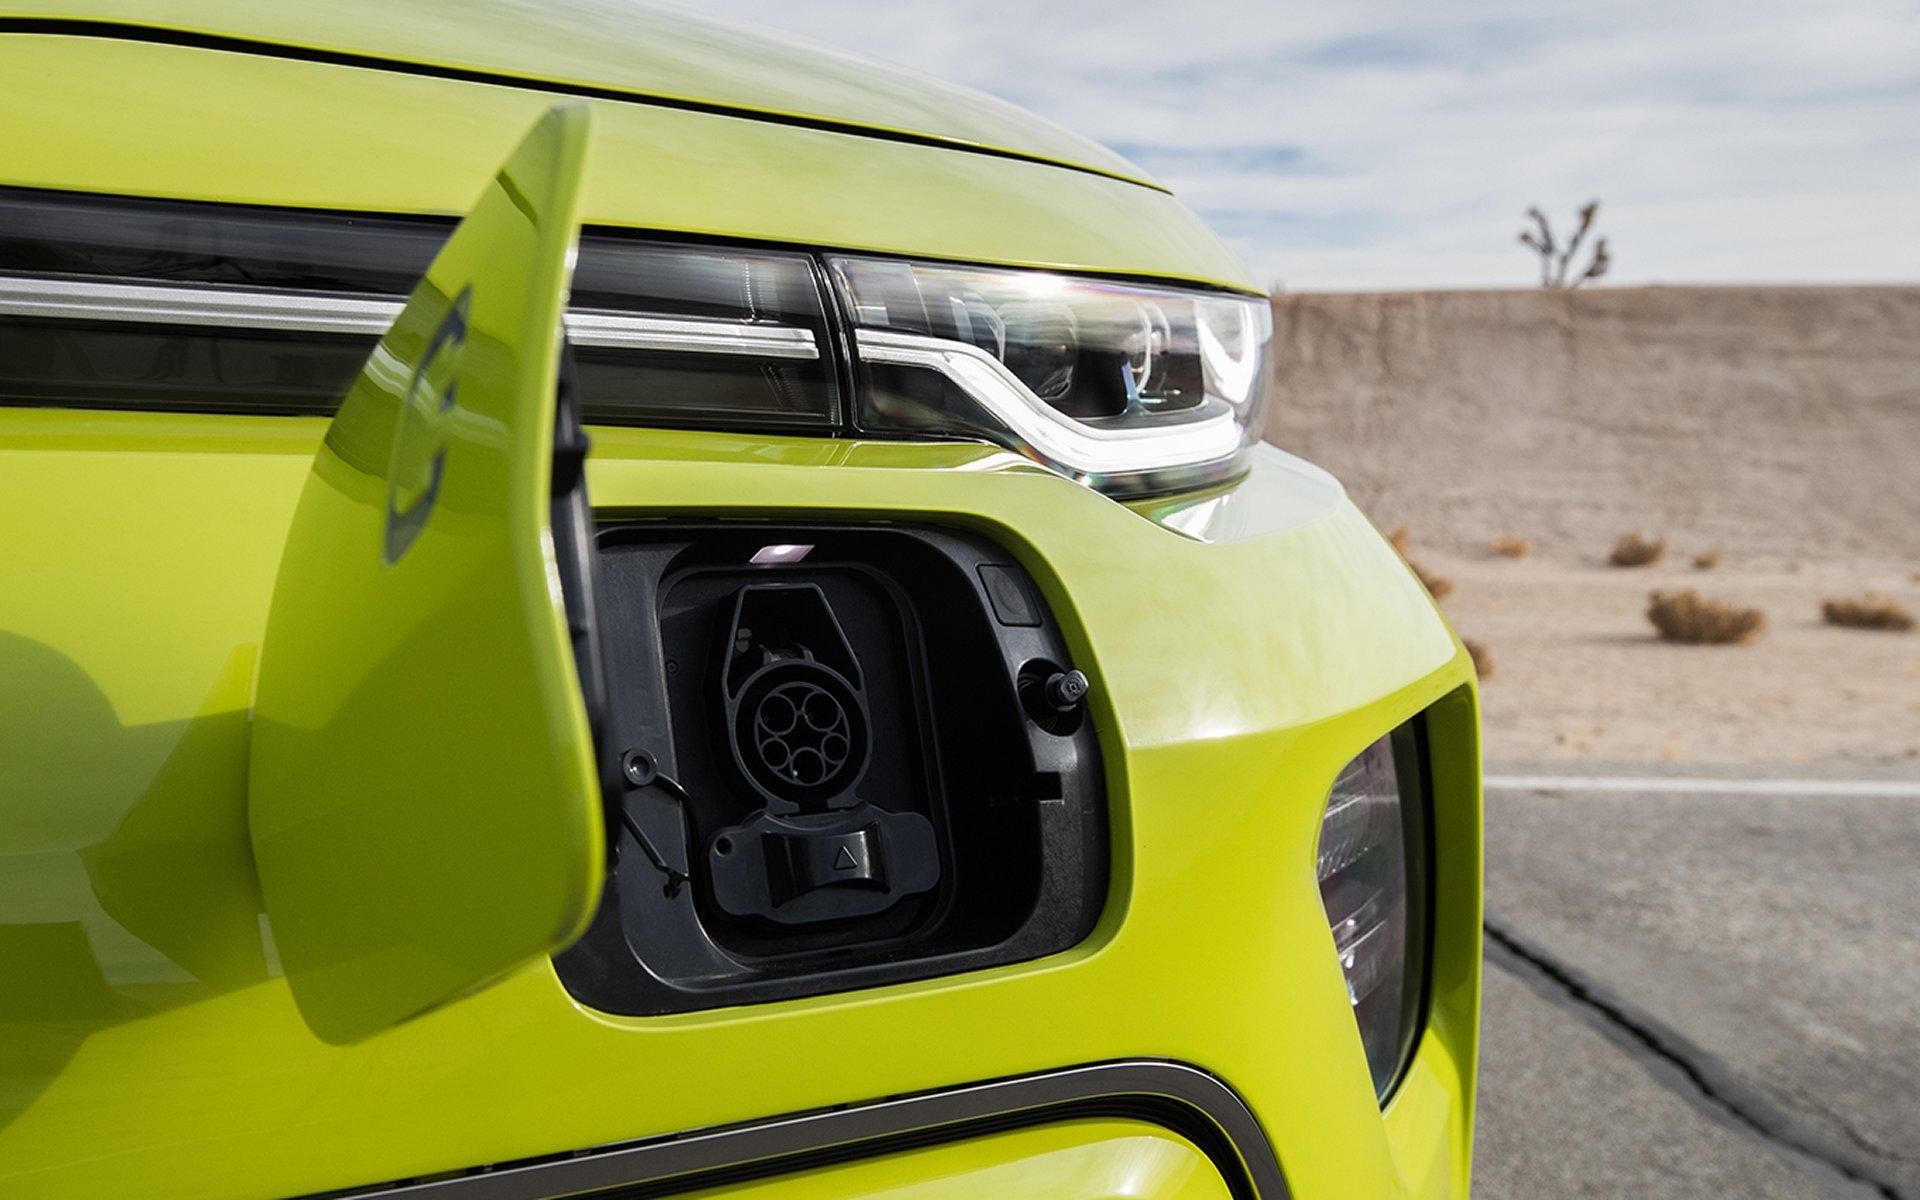 Charging Port of the 2020 Soul EV